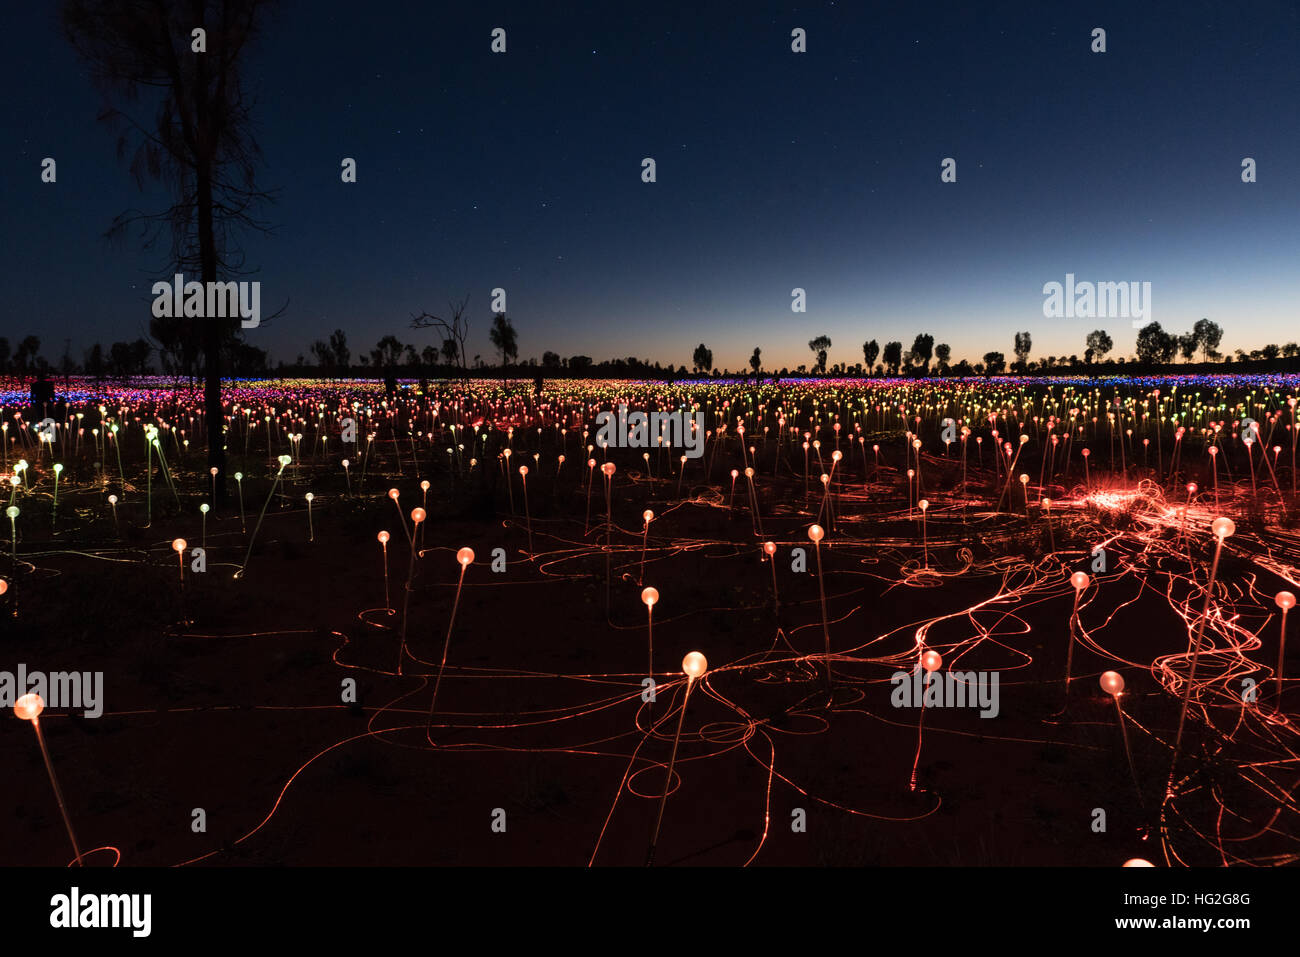 Campo di luce da parte di un artista Bruce Monro a Ayers Rock / Uluru, Australia ha migliaia di luci colorate Foto Stock